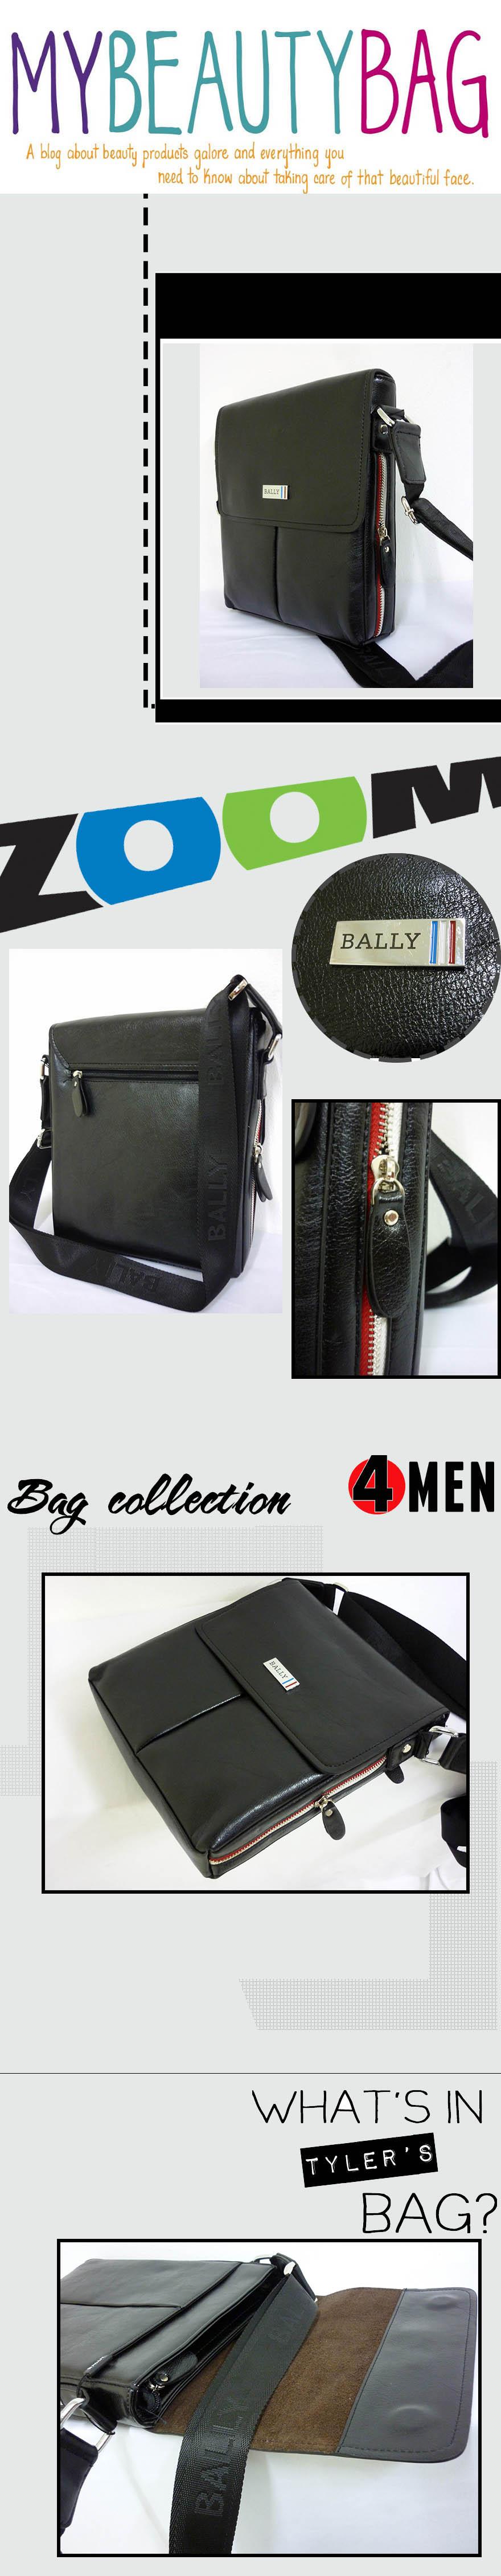 Túi xách da đen bally txf004 - 1